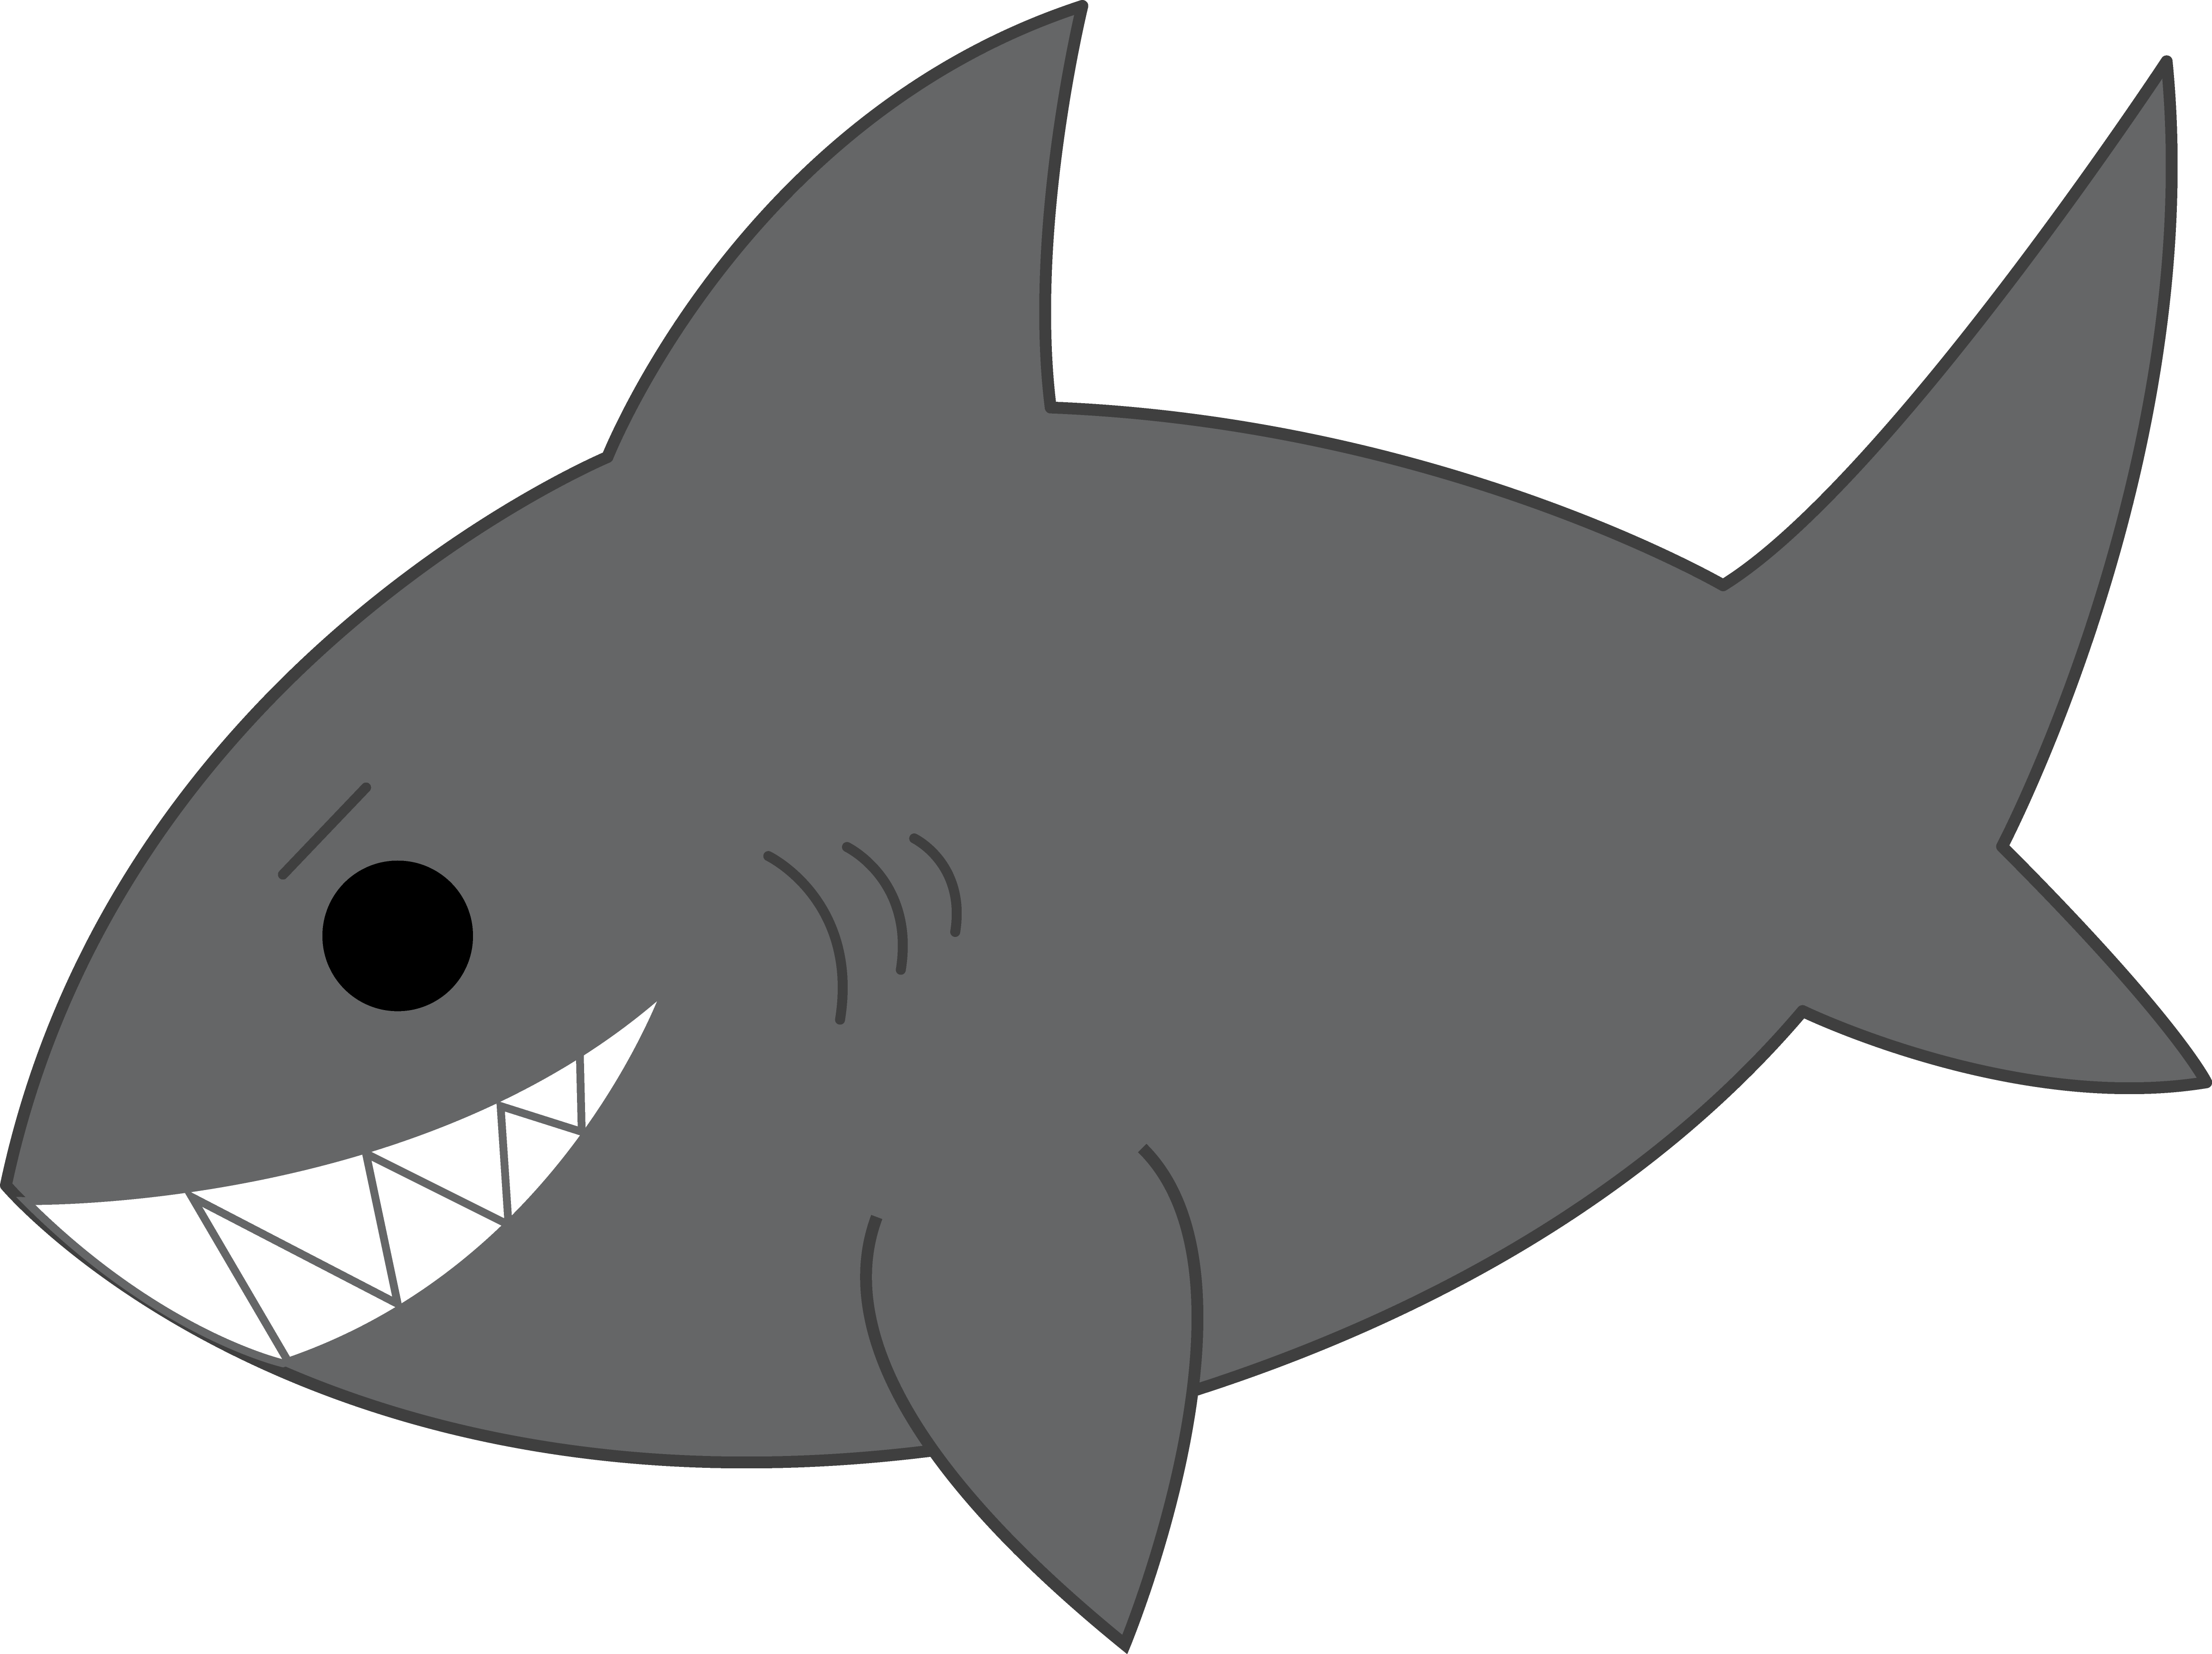 Shark black and white shark clip art black and white free.